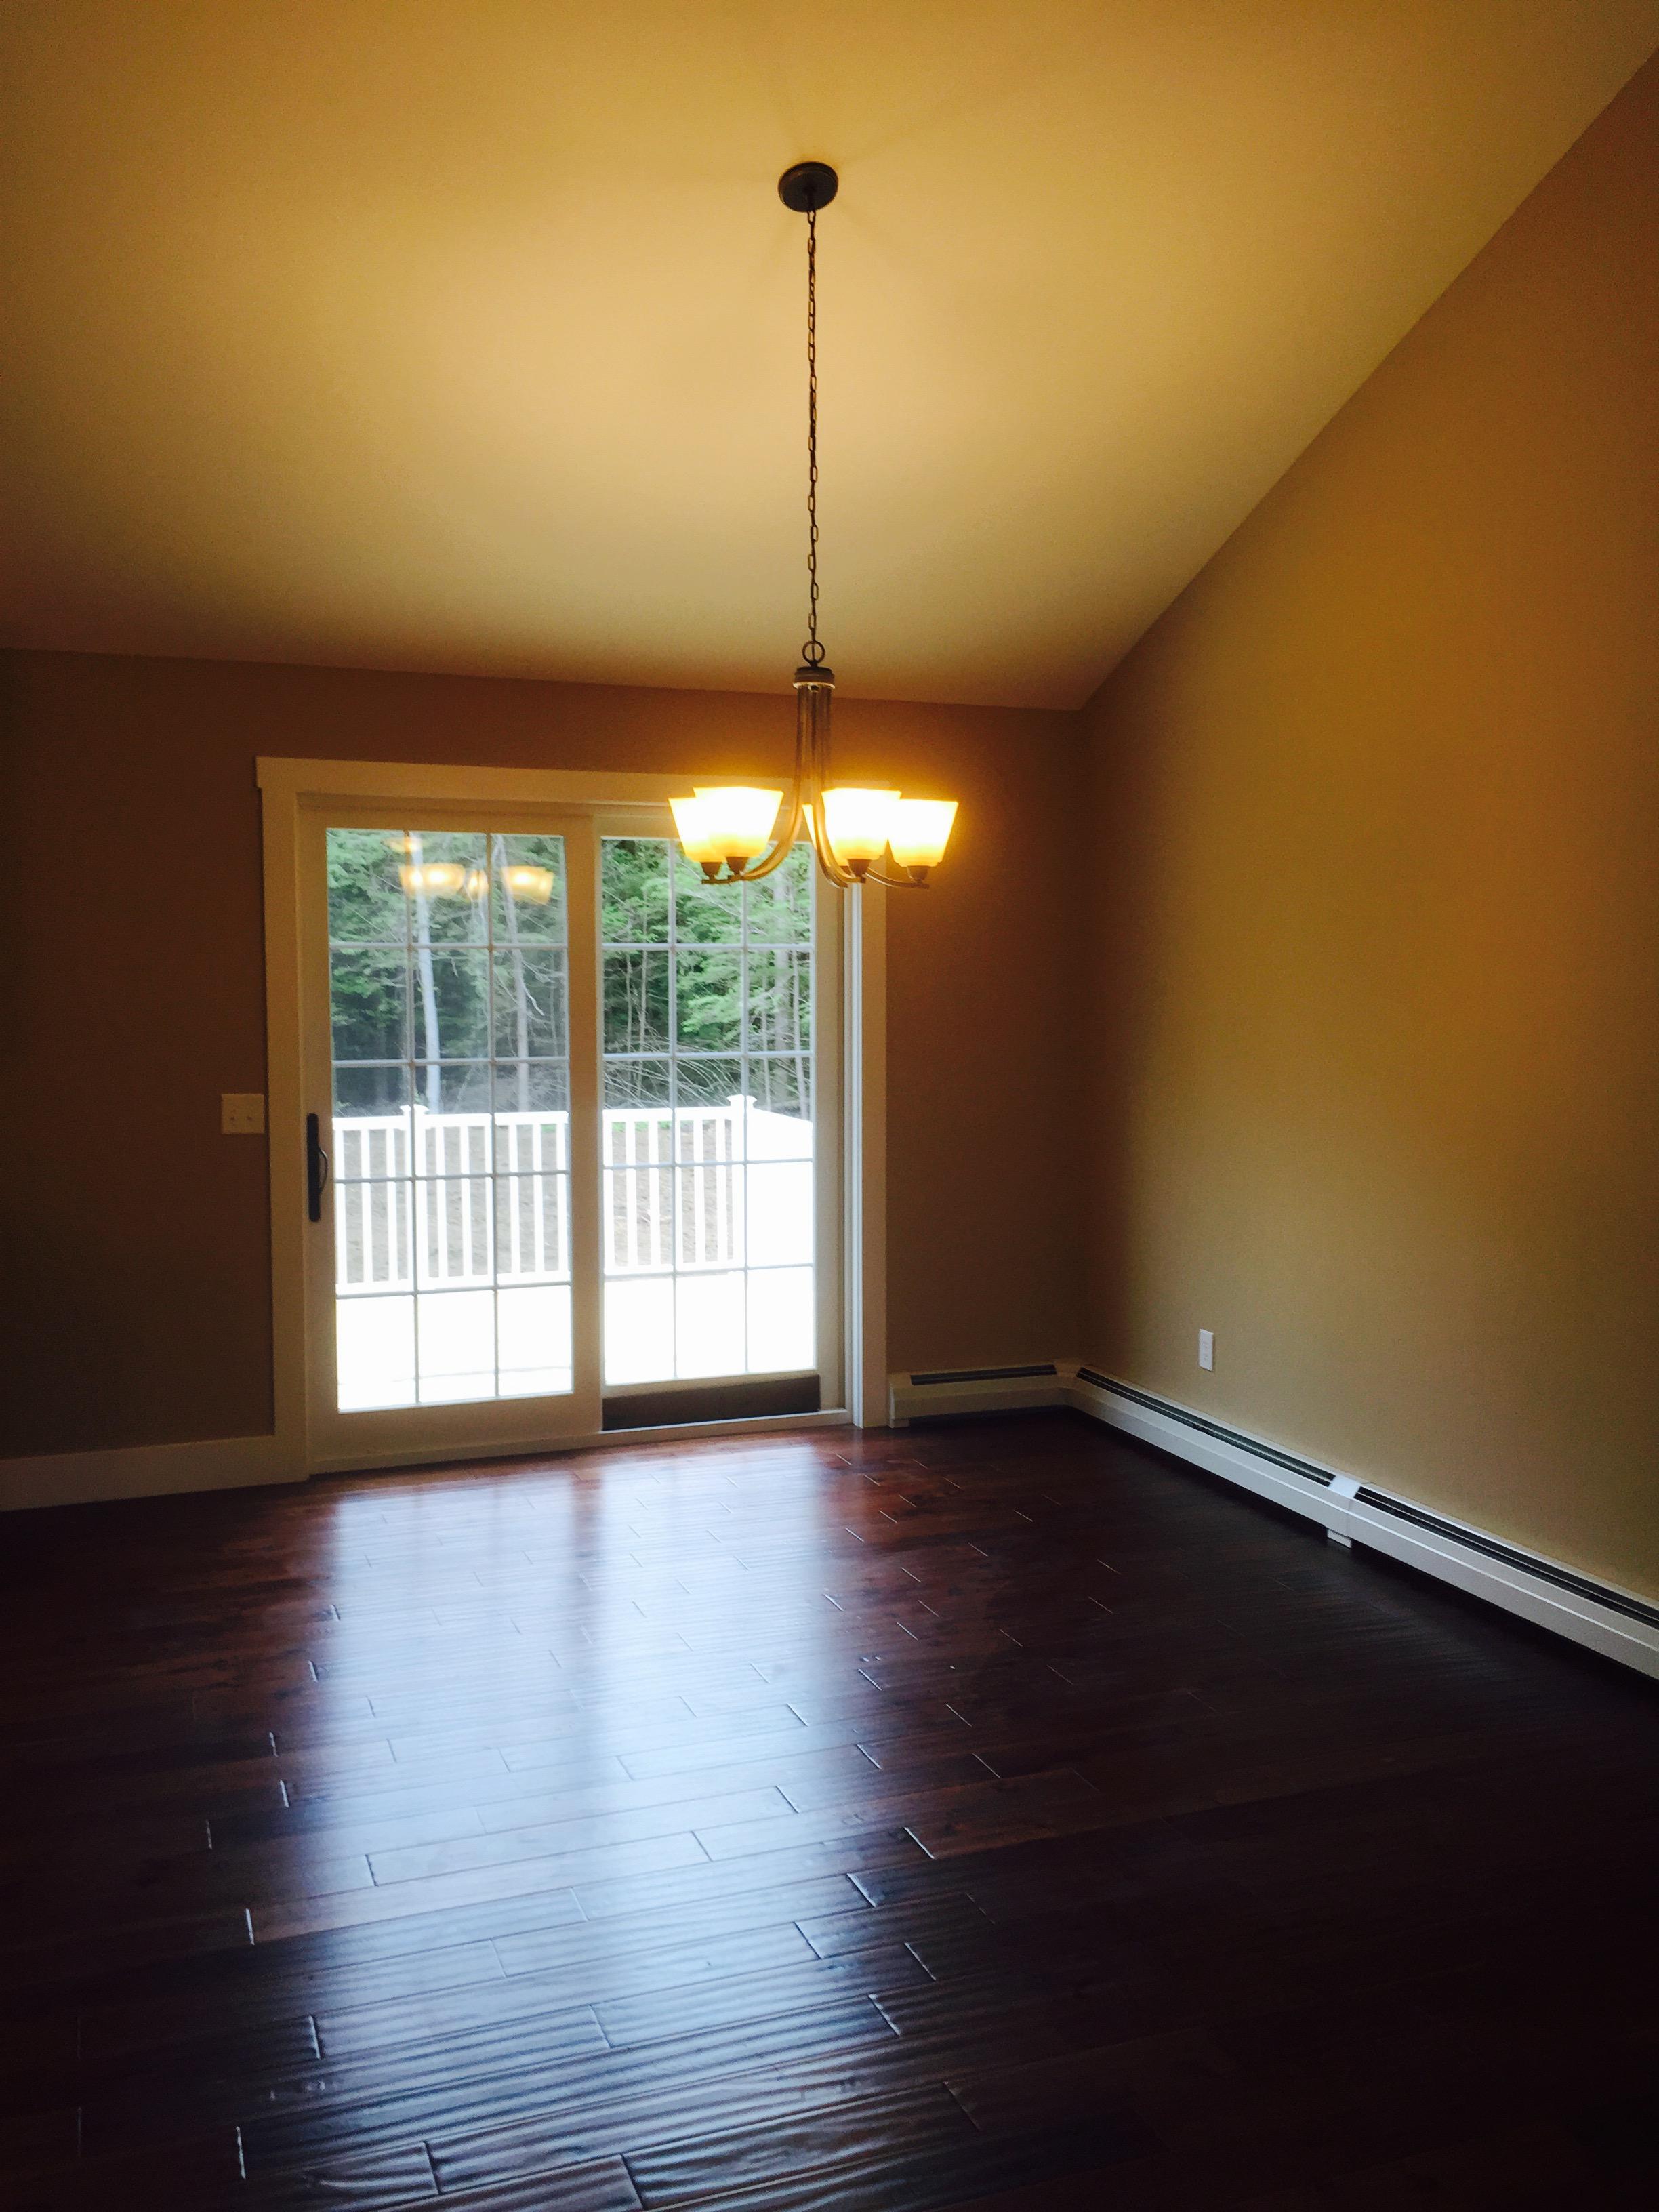 Dining room with hardwood floors